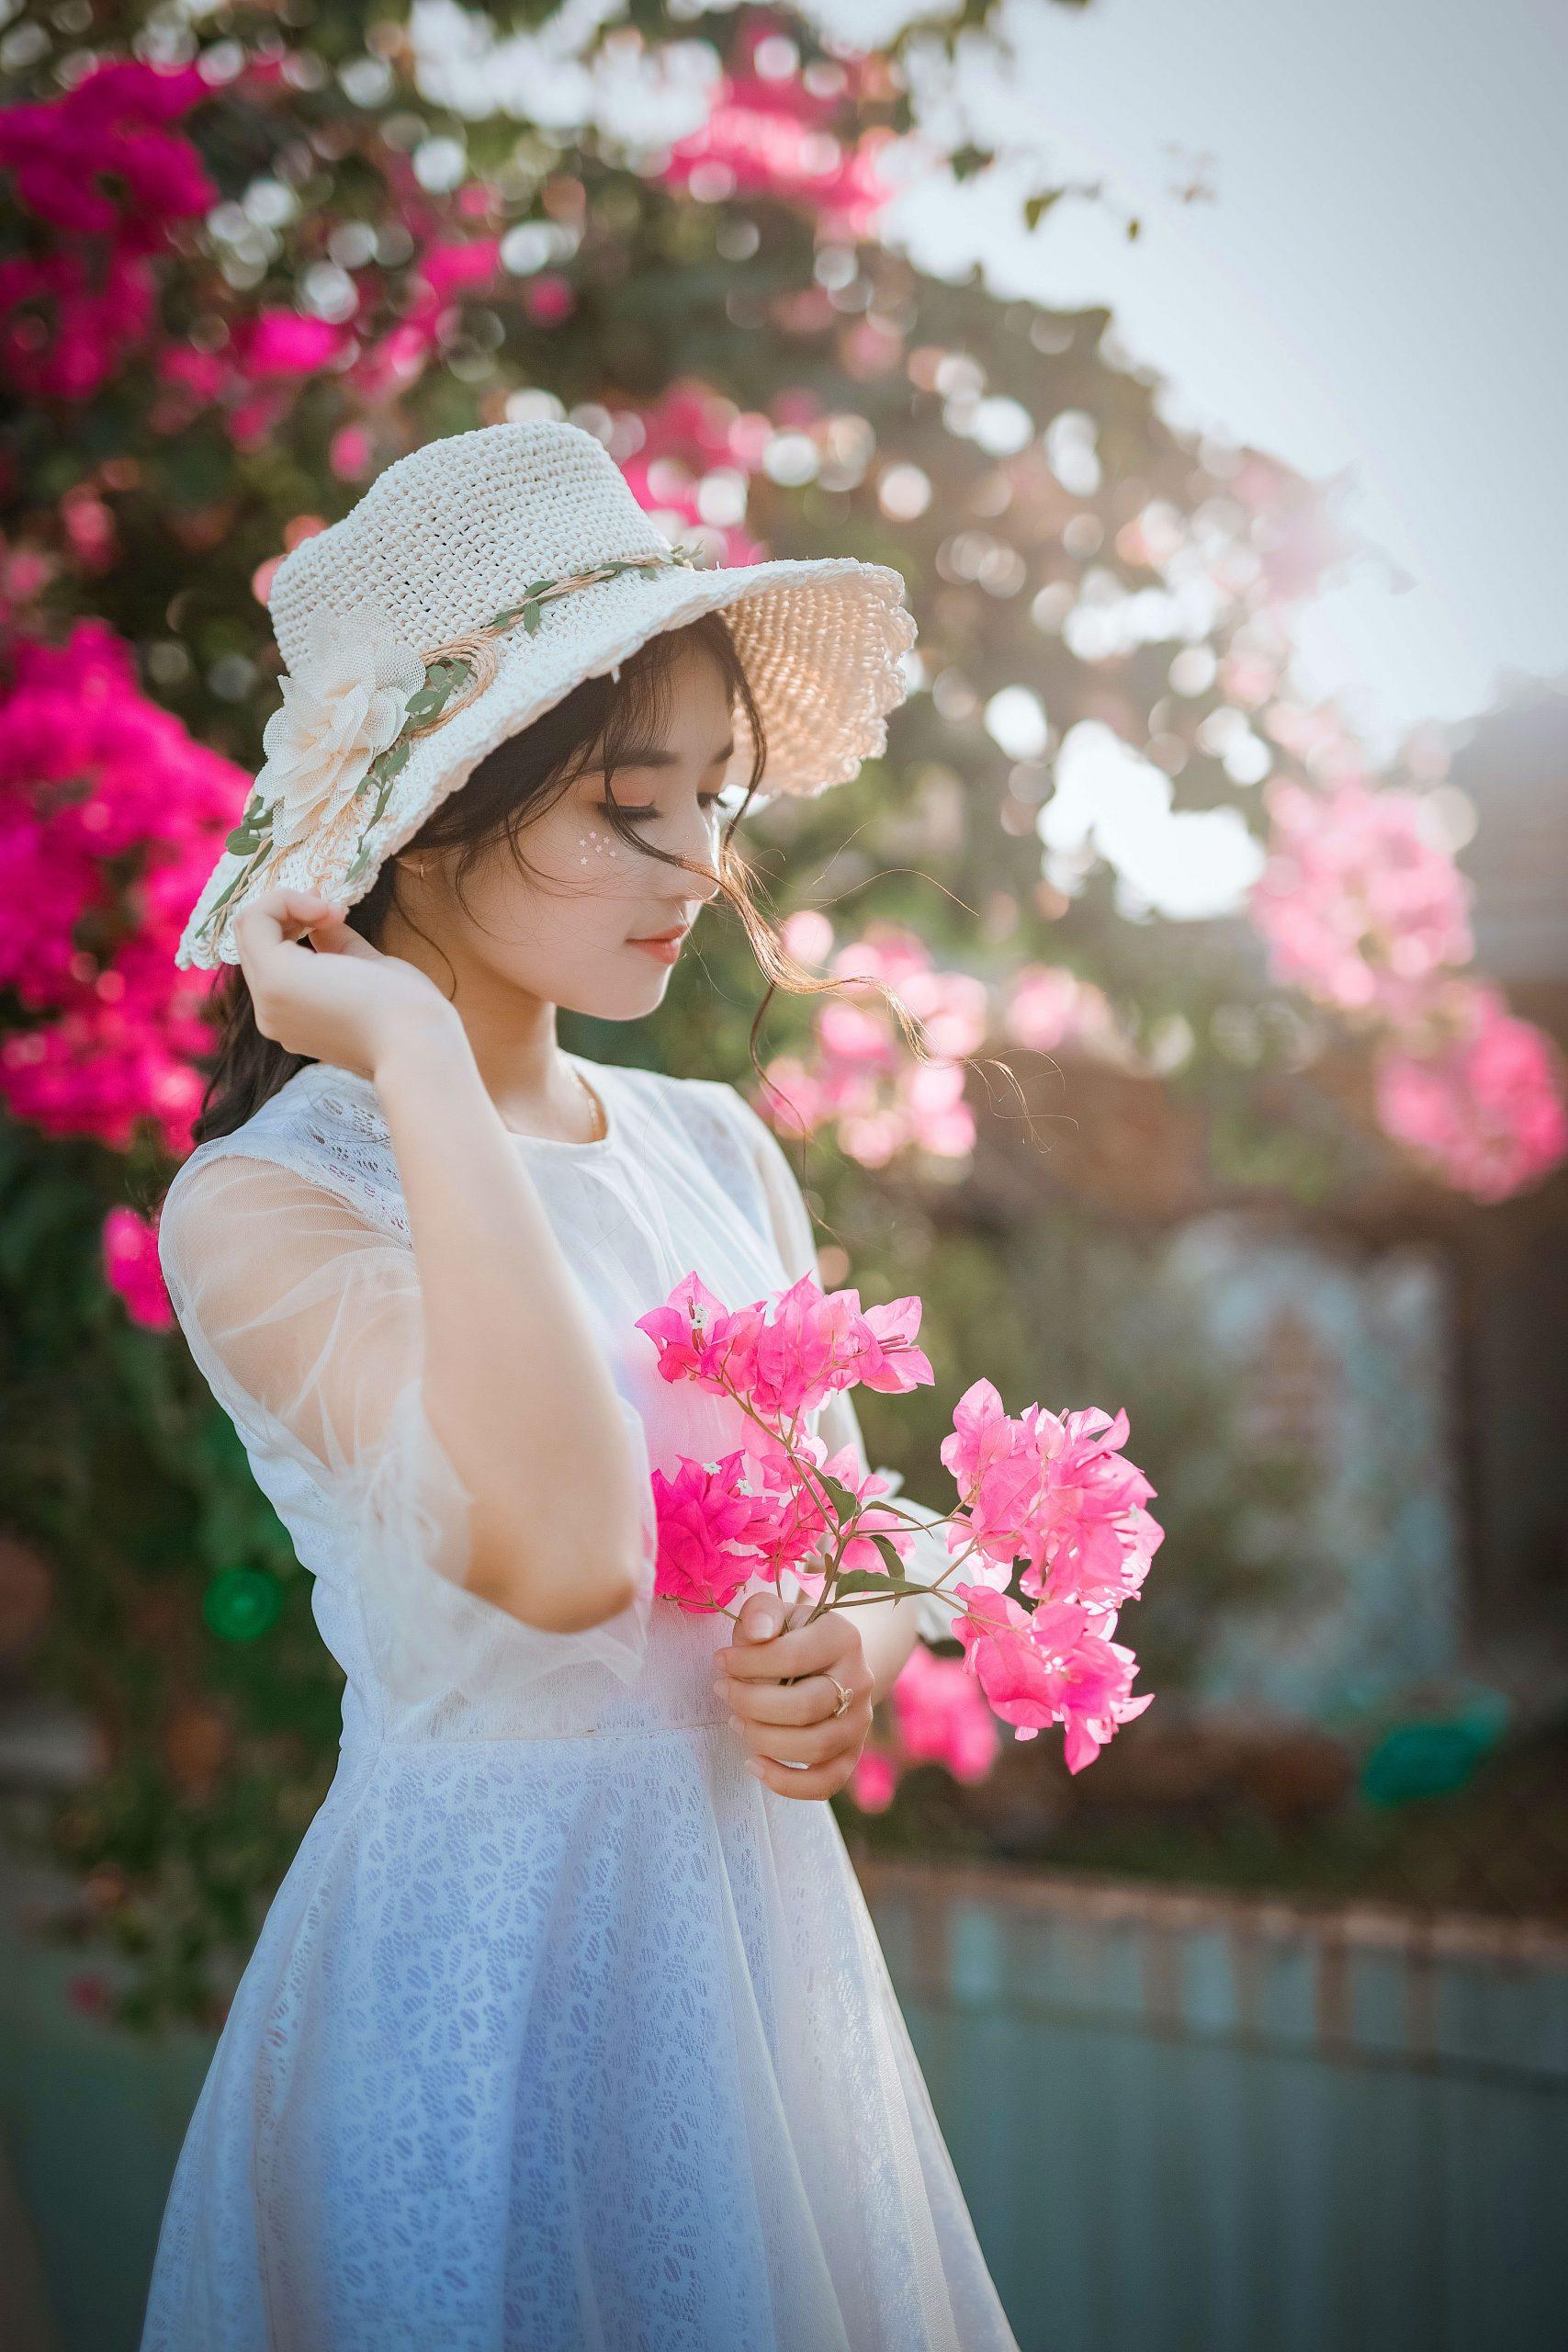 2021 Very Sad Girl Whatsapp Dp Images 1080p hd